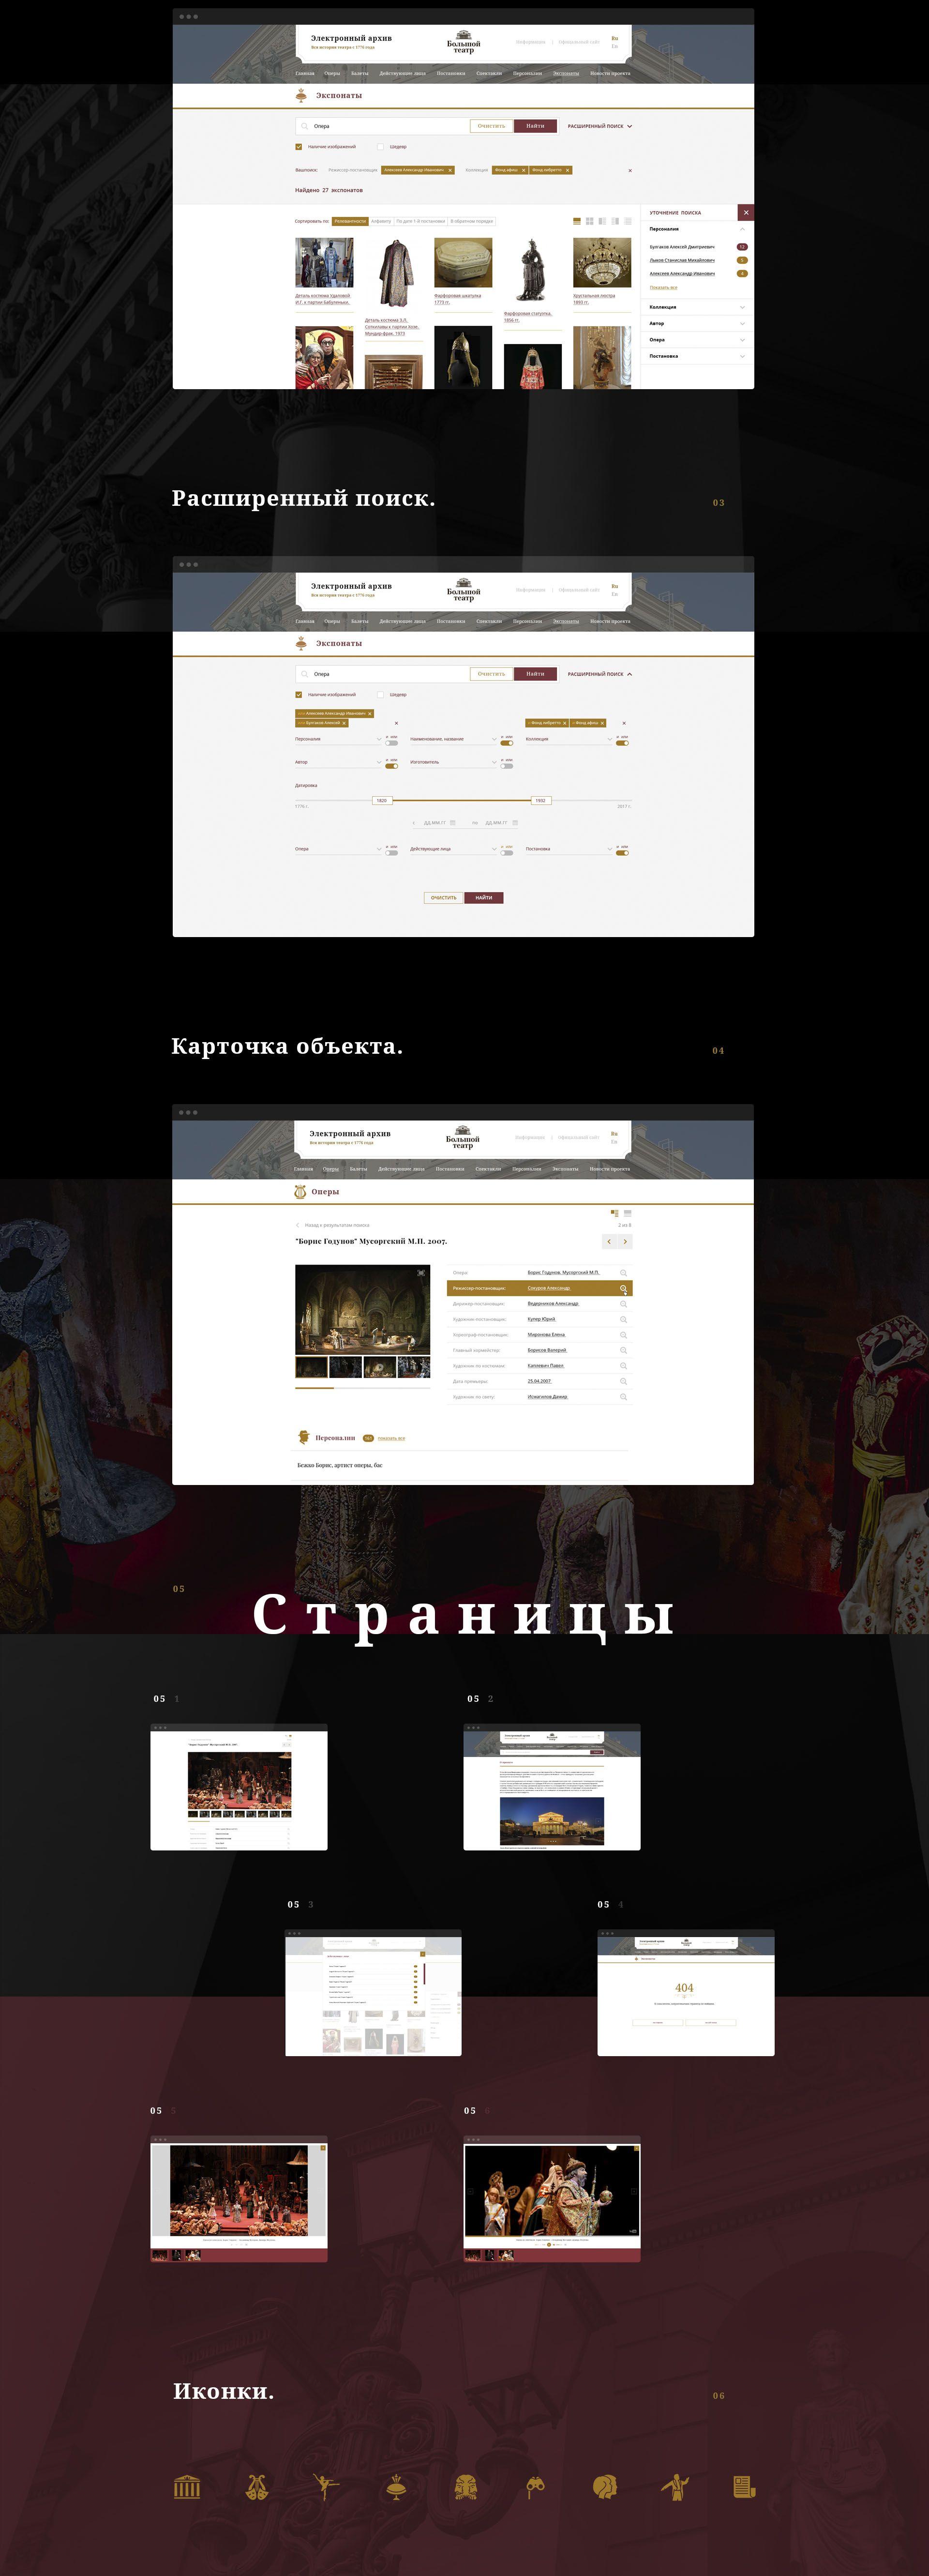 Большой театр сайт